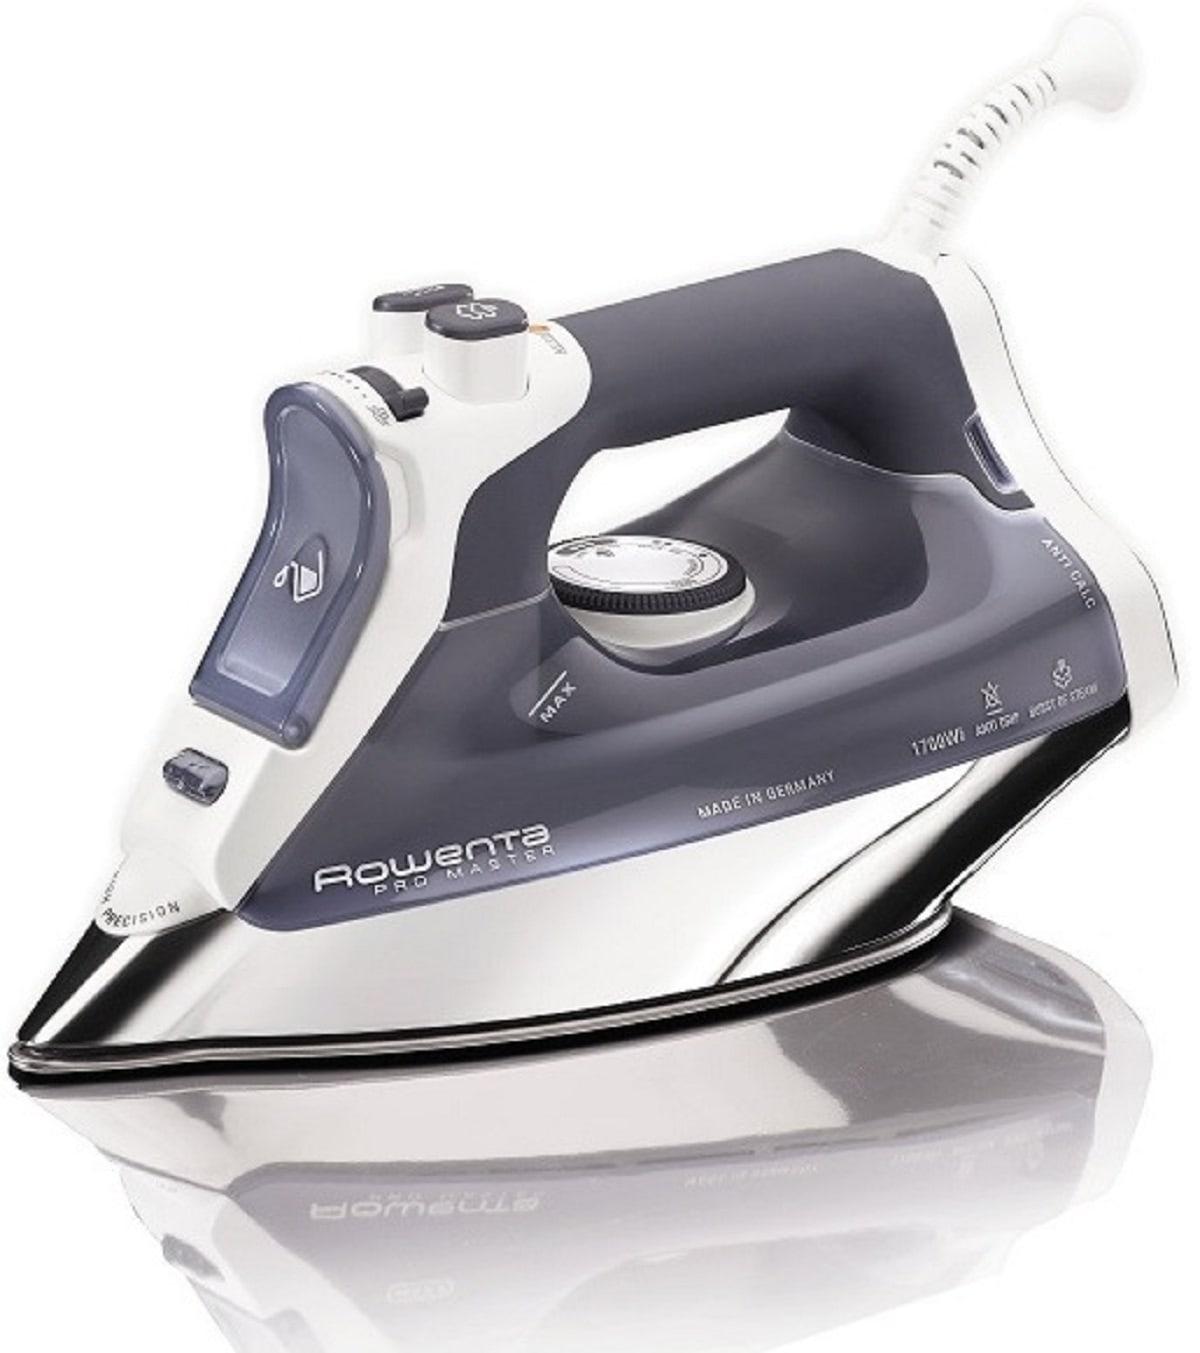 Rowenta DW8080 Iron